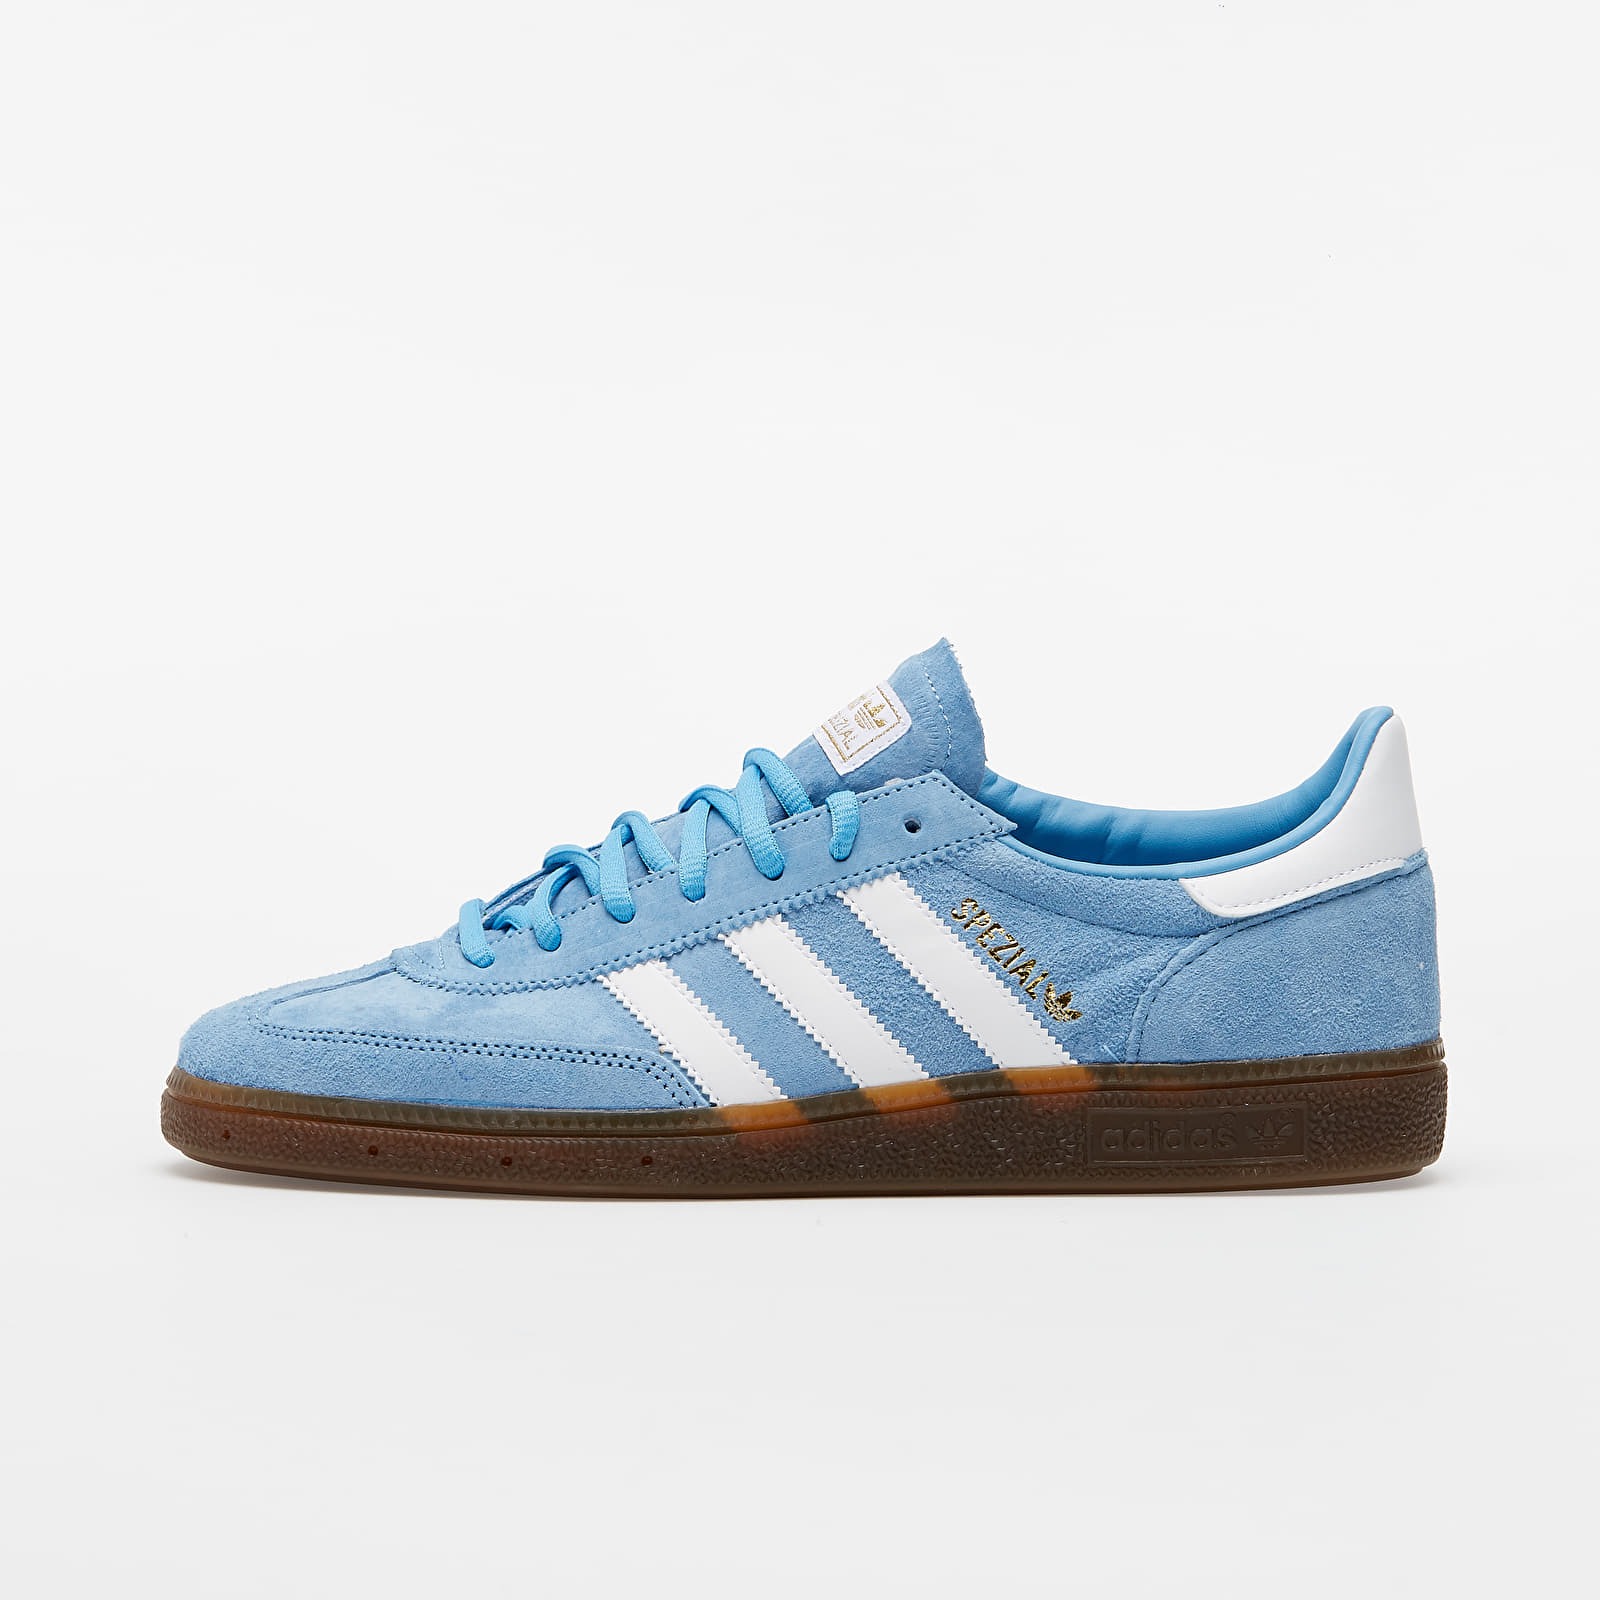 Men's shoes adidas Handball Spezial Ltblue/ Ftw White/ Gum5